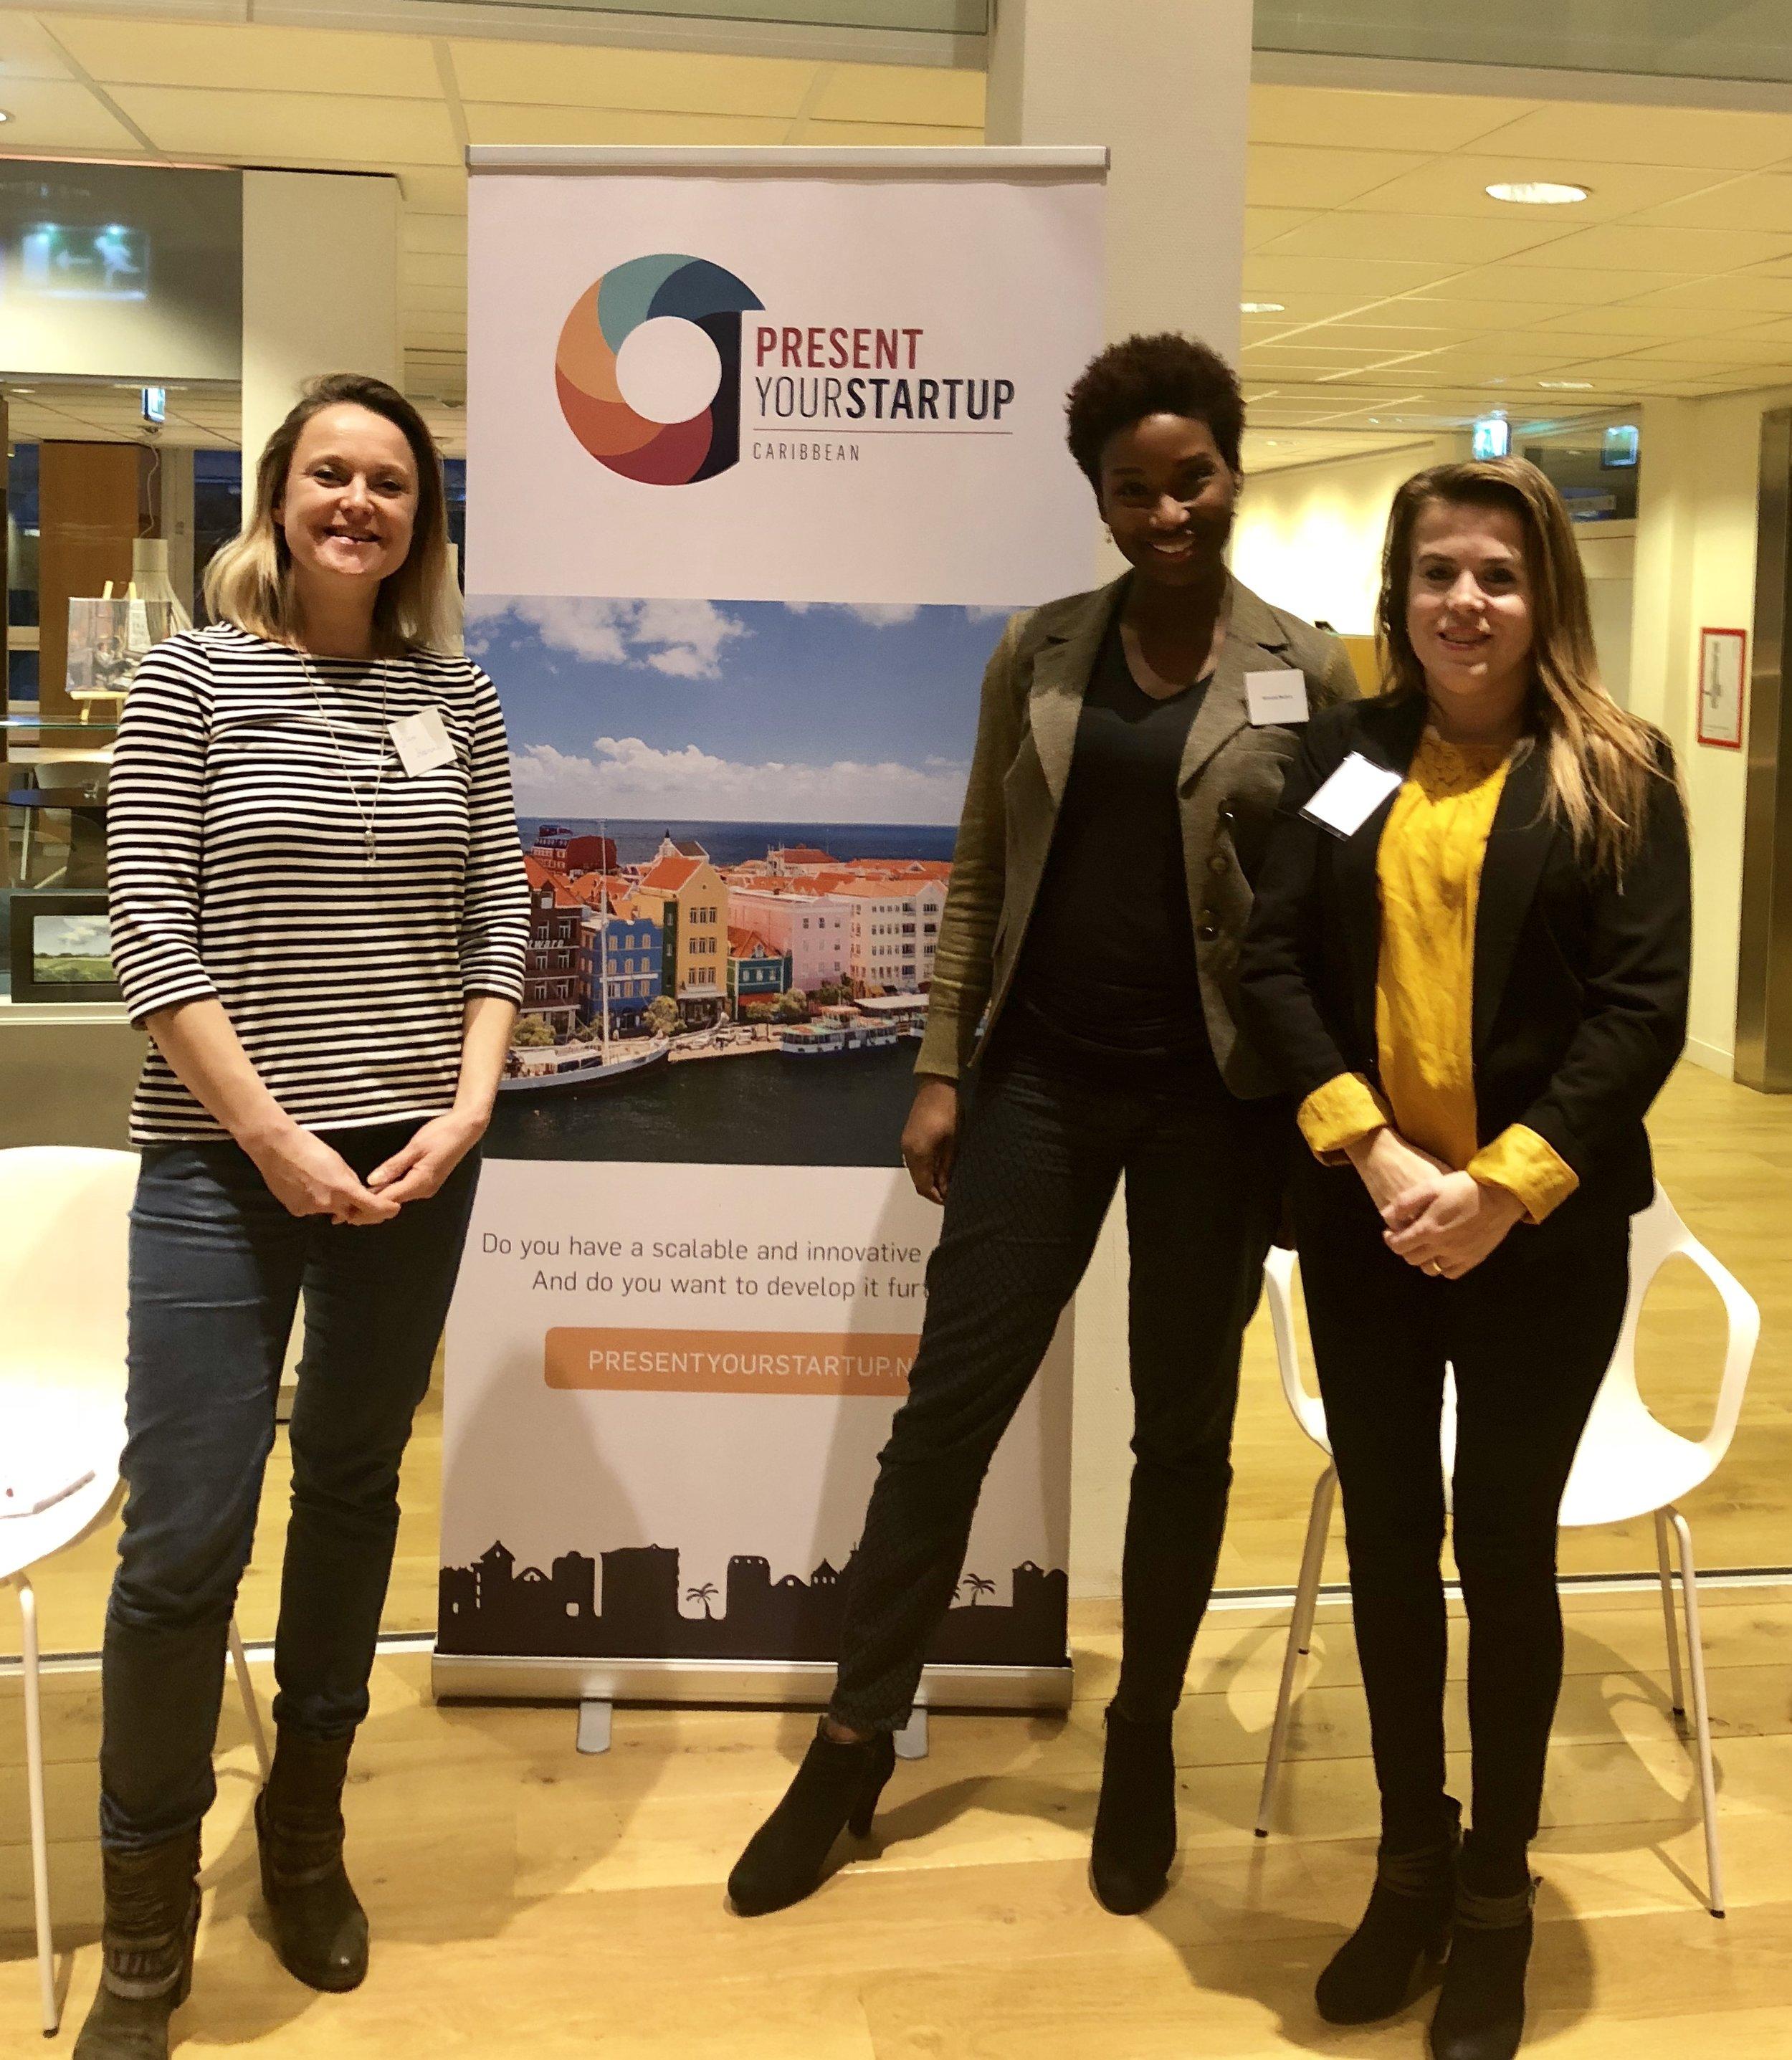 Jildous Steensma, Milouska Meulens, Valerie Vallenduuk @University Wageningen Netherlands